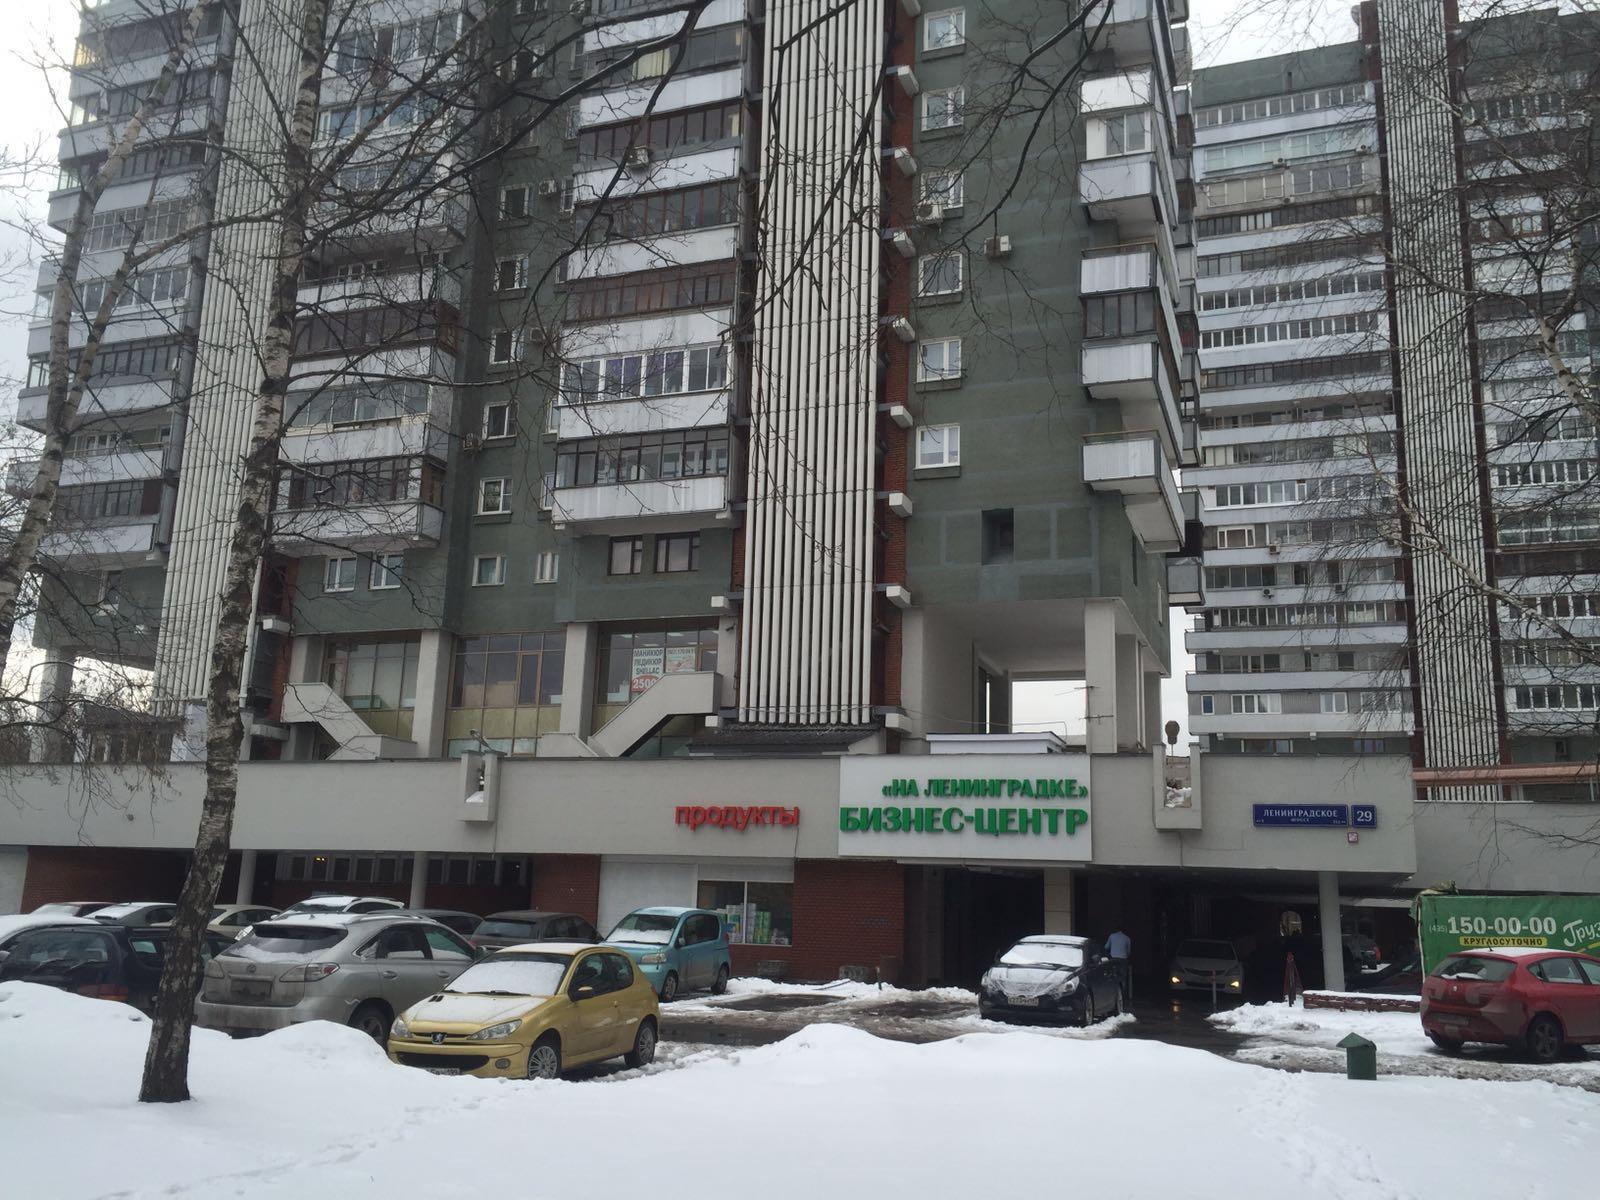 ТРИКОЛОР НА ЛЕНИНГРАДСКОМ ШОССЕ  Д.31